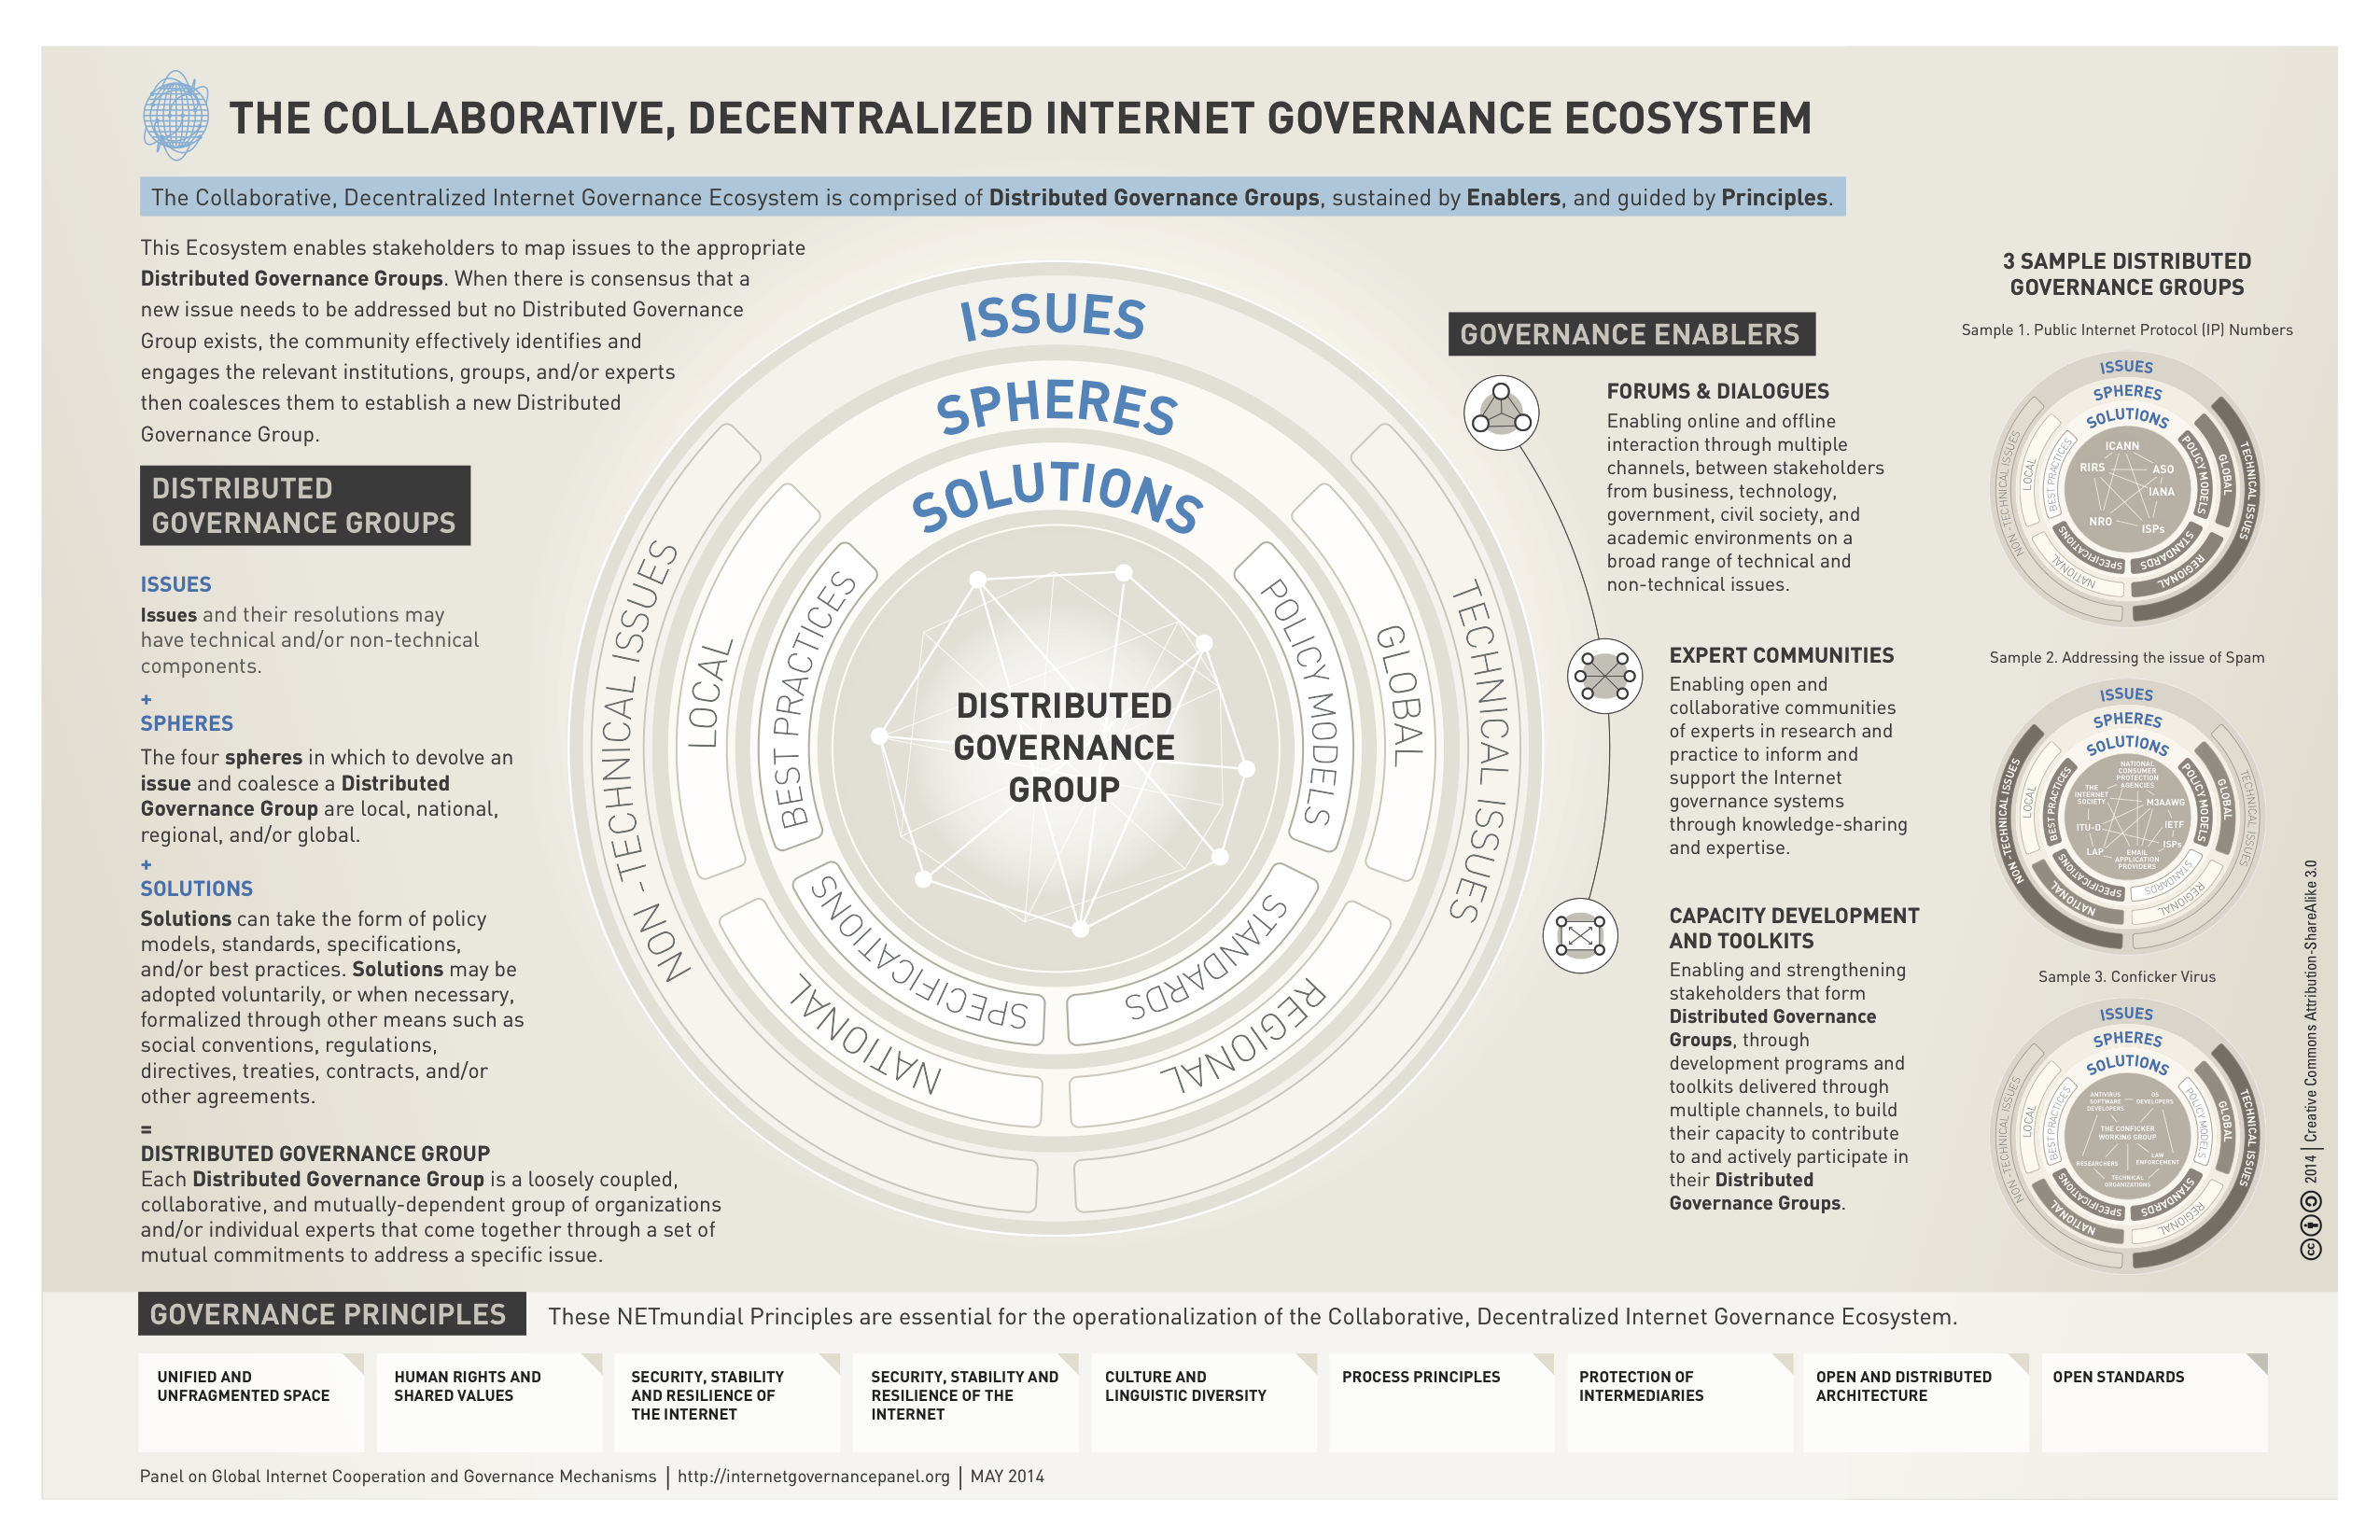 The Collaborative, Decentralized Internet Governance Ecosystem